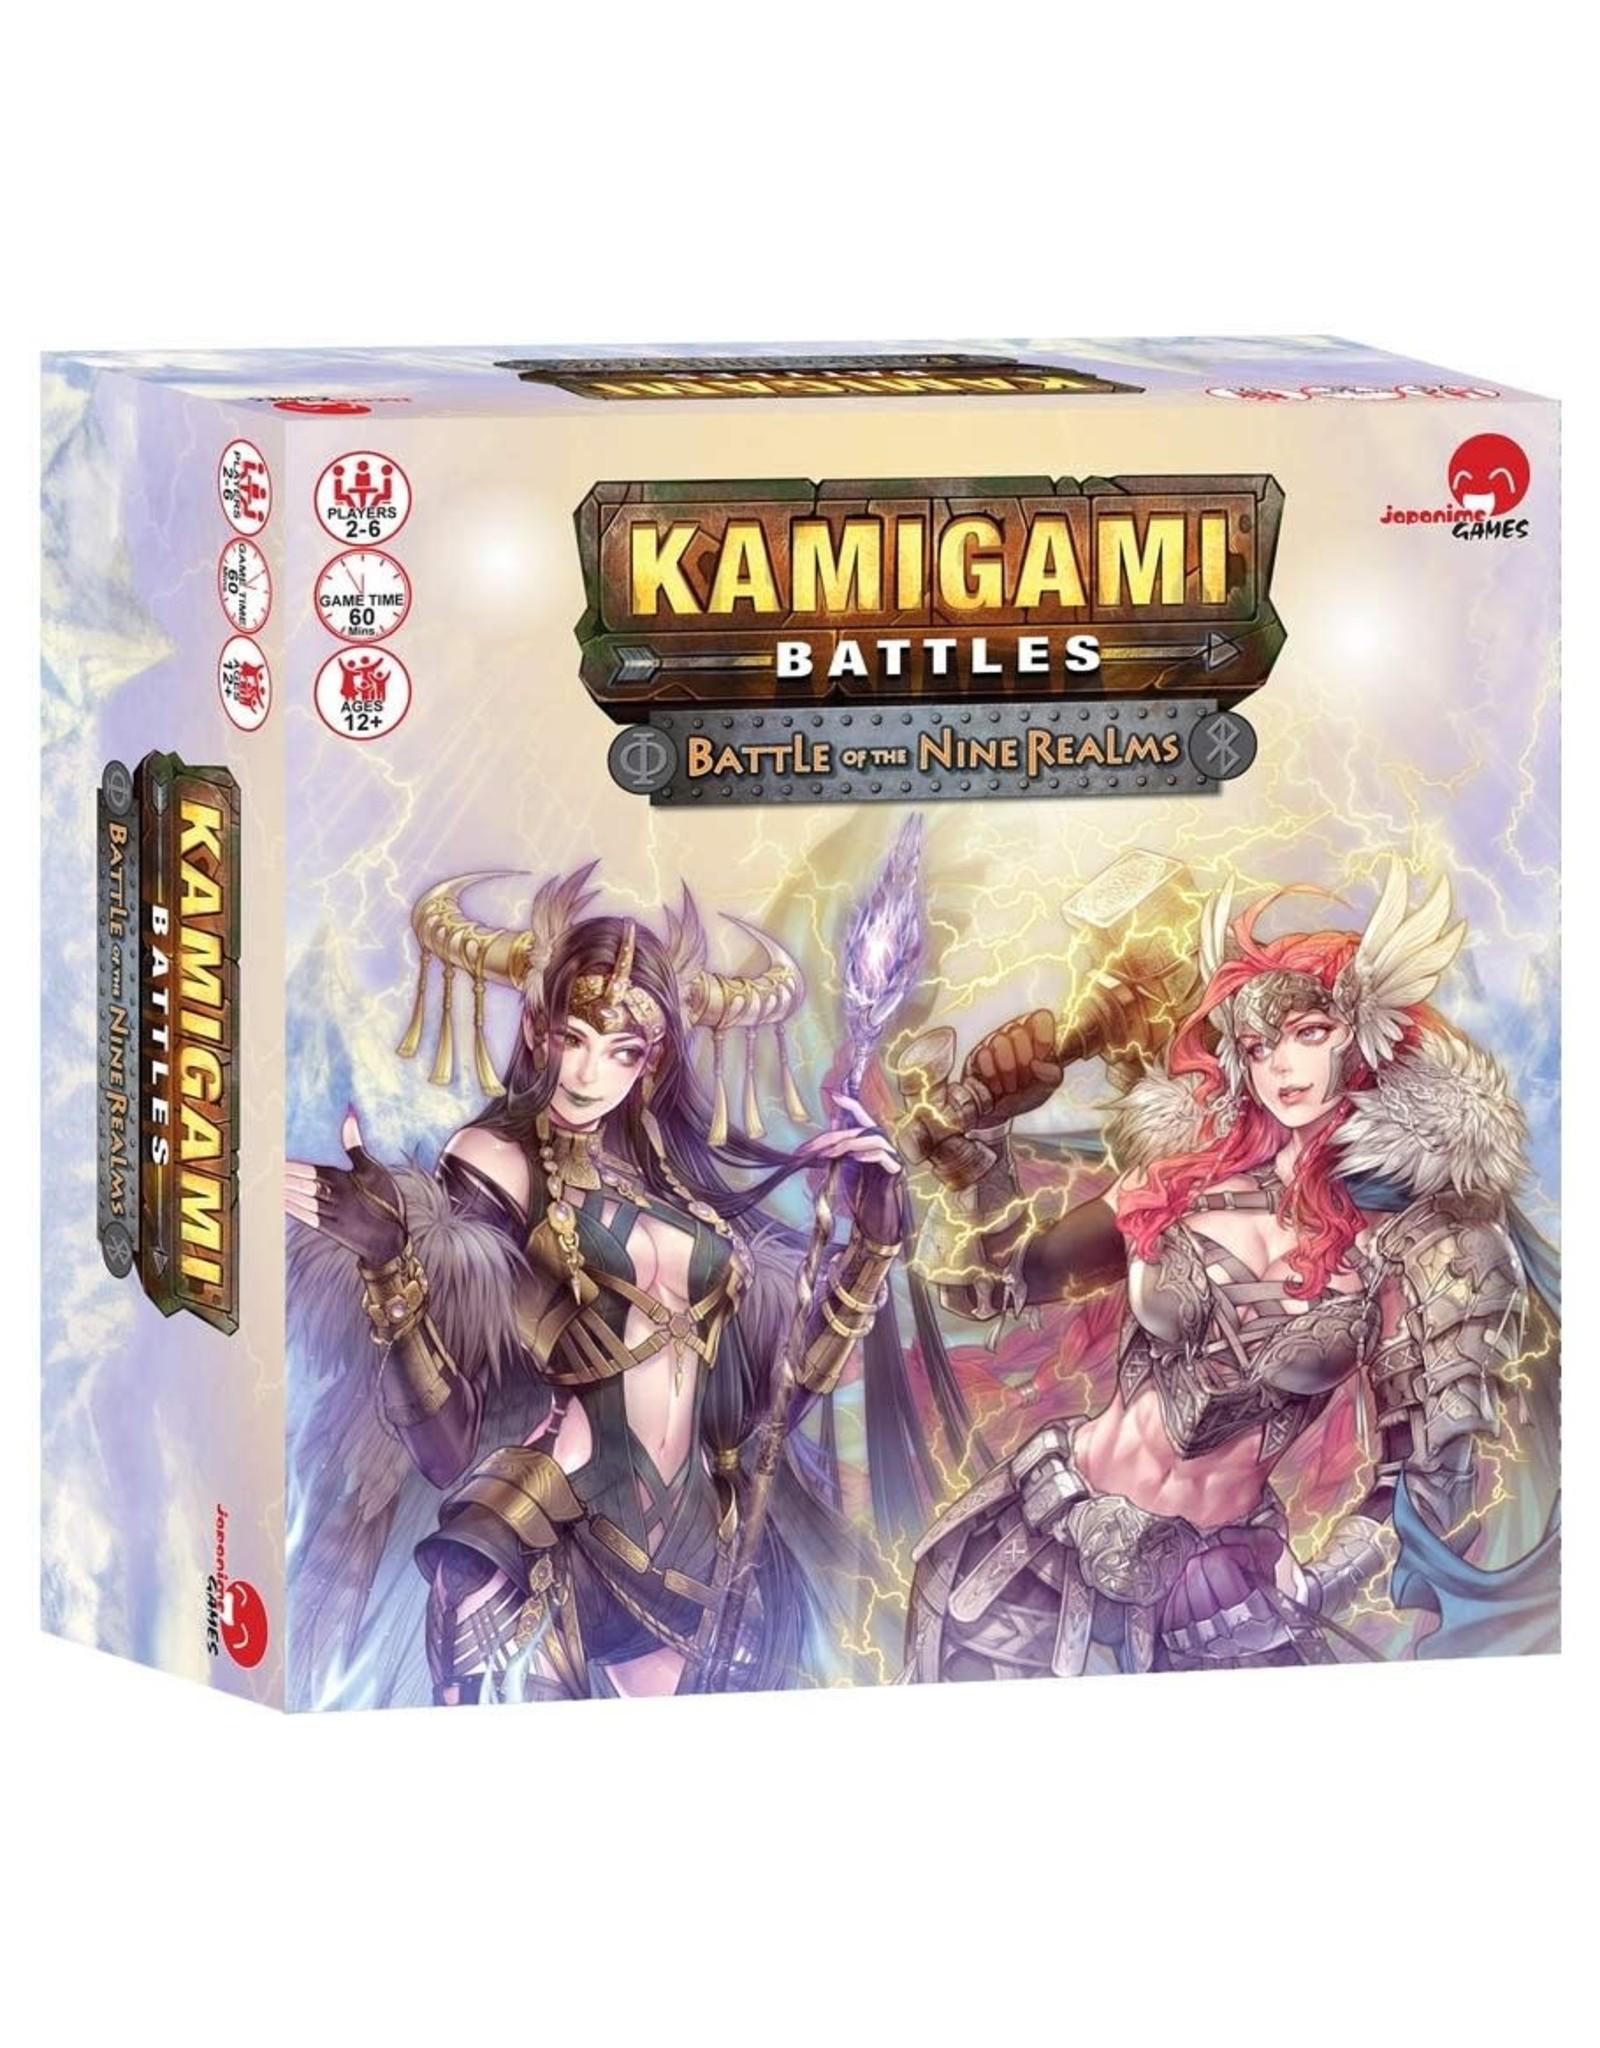 Japanime Games Kamigami Battles: Battle of the Nine Realms